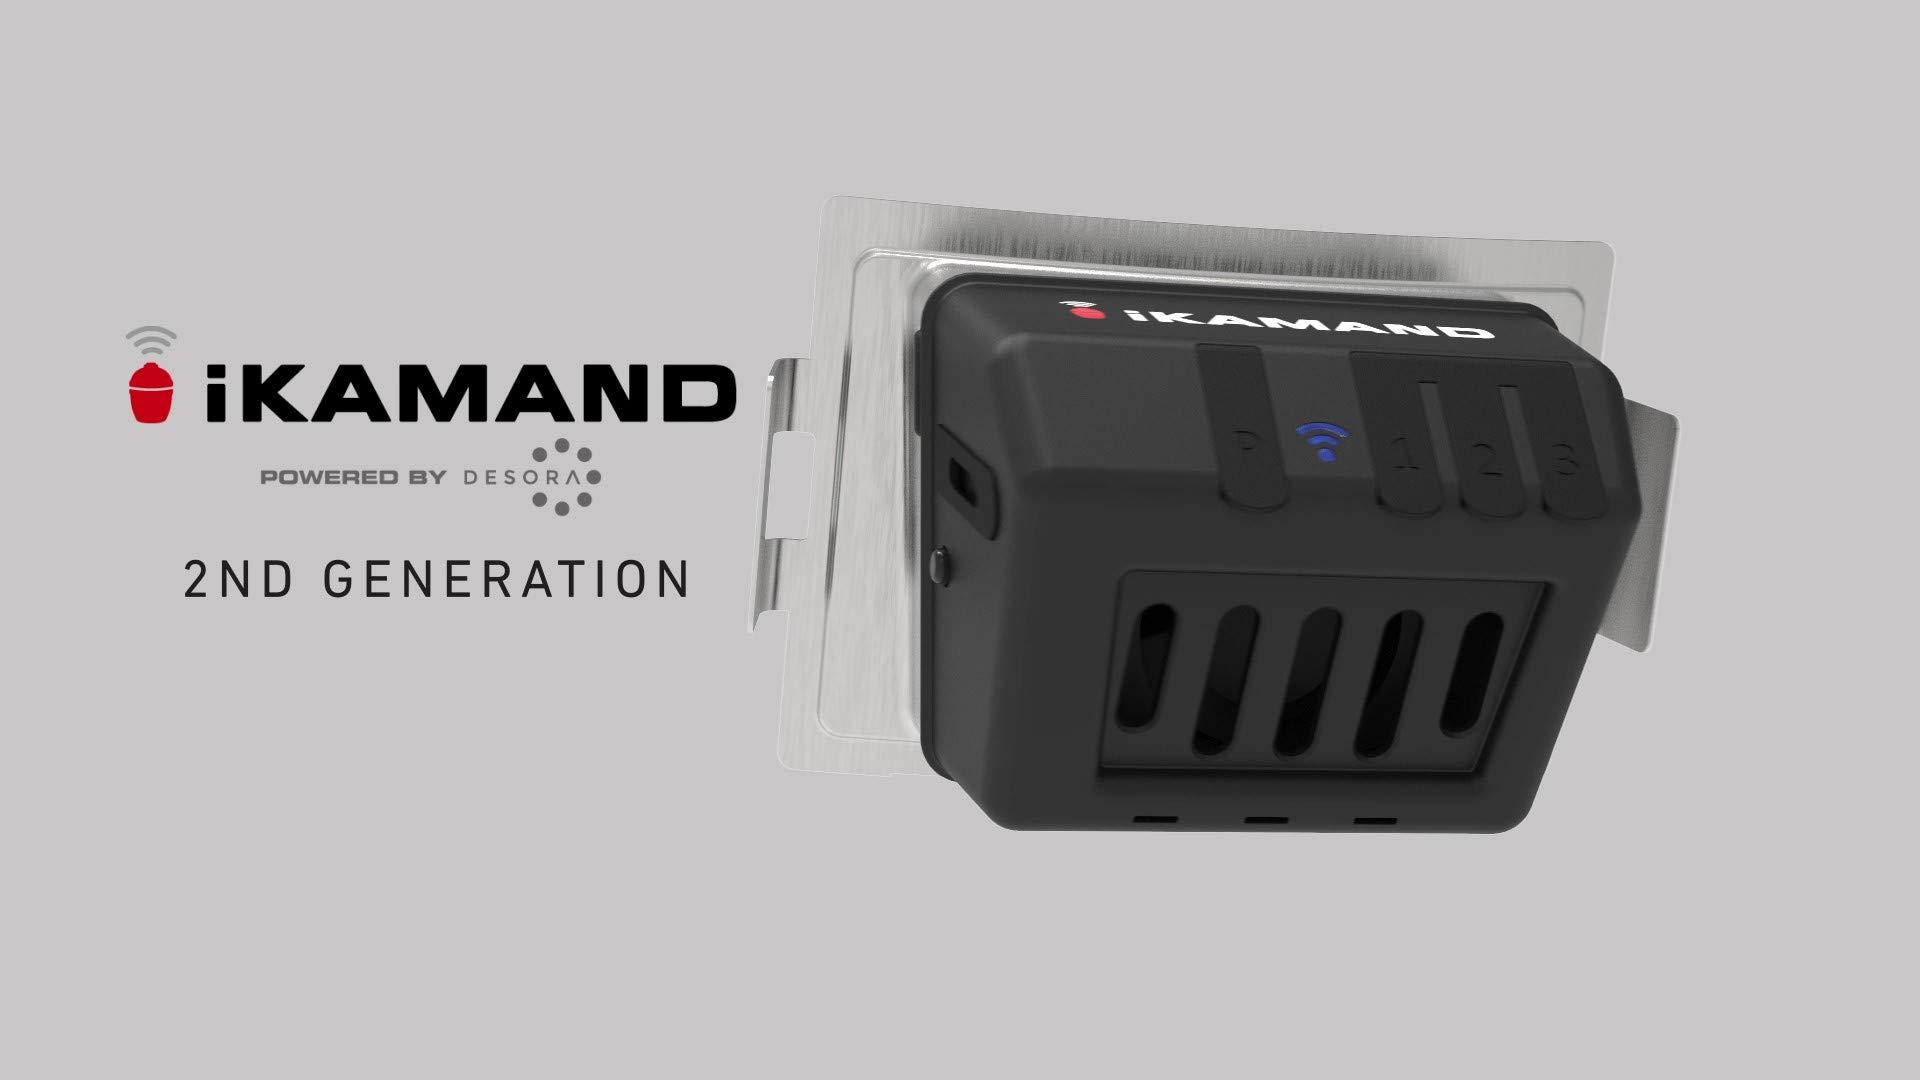 iKamand 2nd Generation for Classic Joe & Classic Joe II